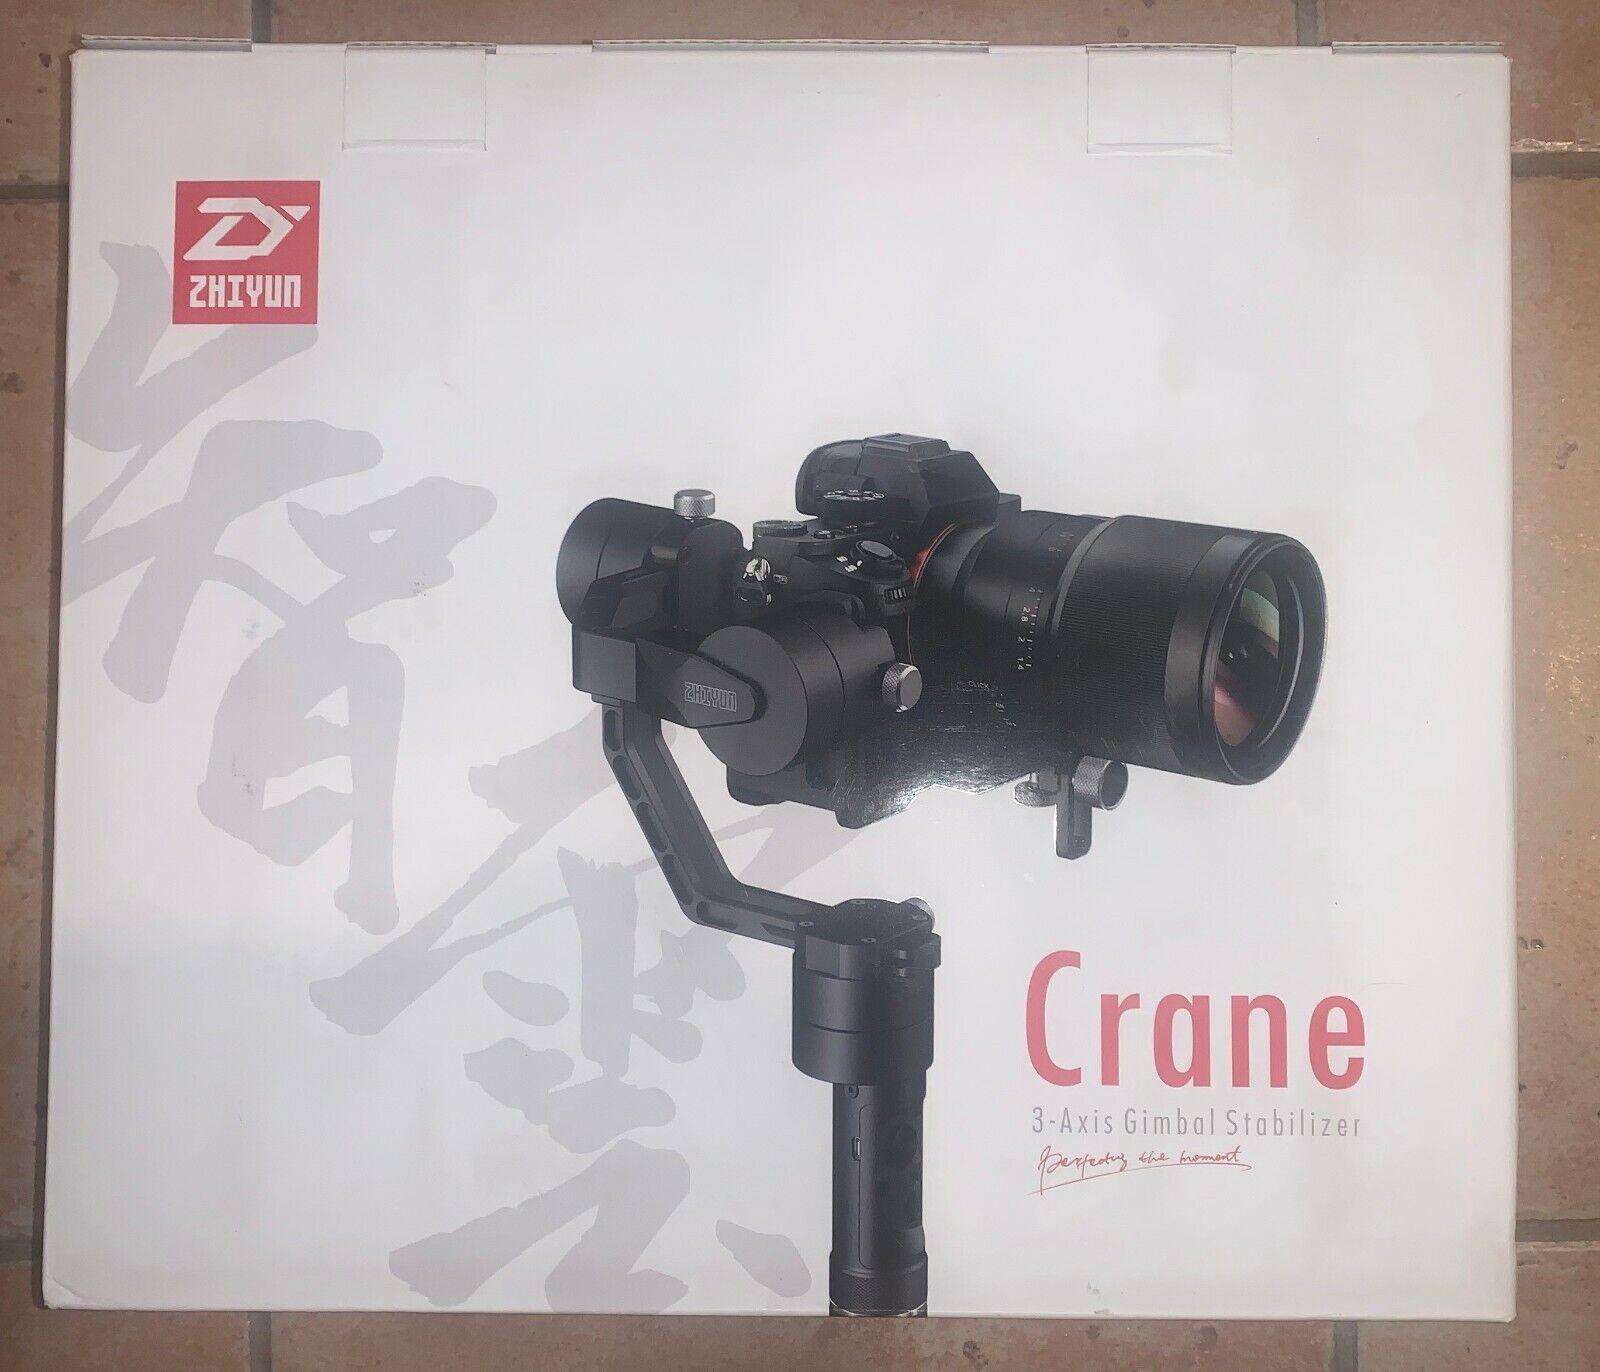 Zhiyun-Tech Crane v2 3-Axis Handheld Gimbal Stabilizer!! STA